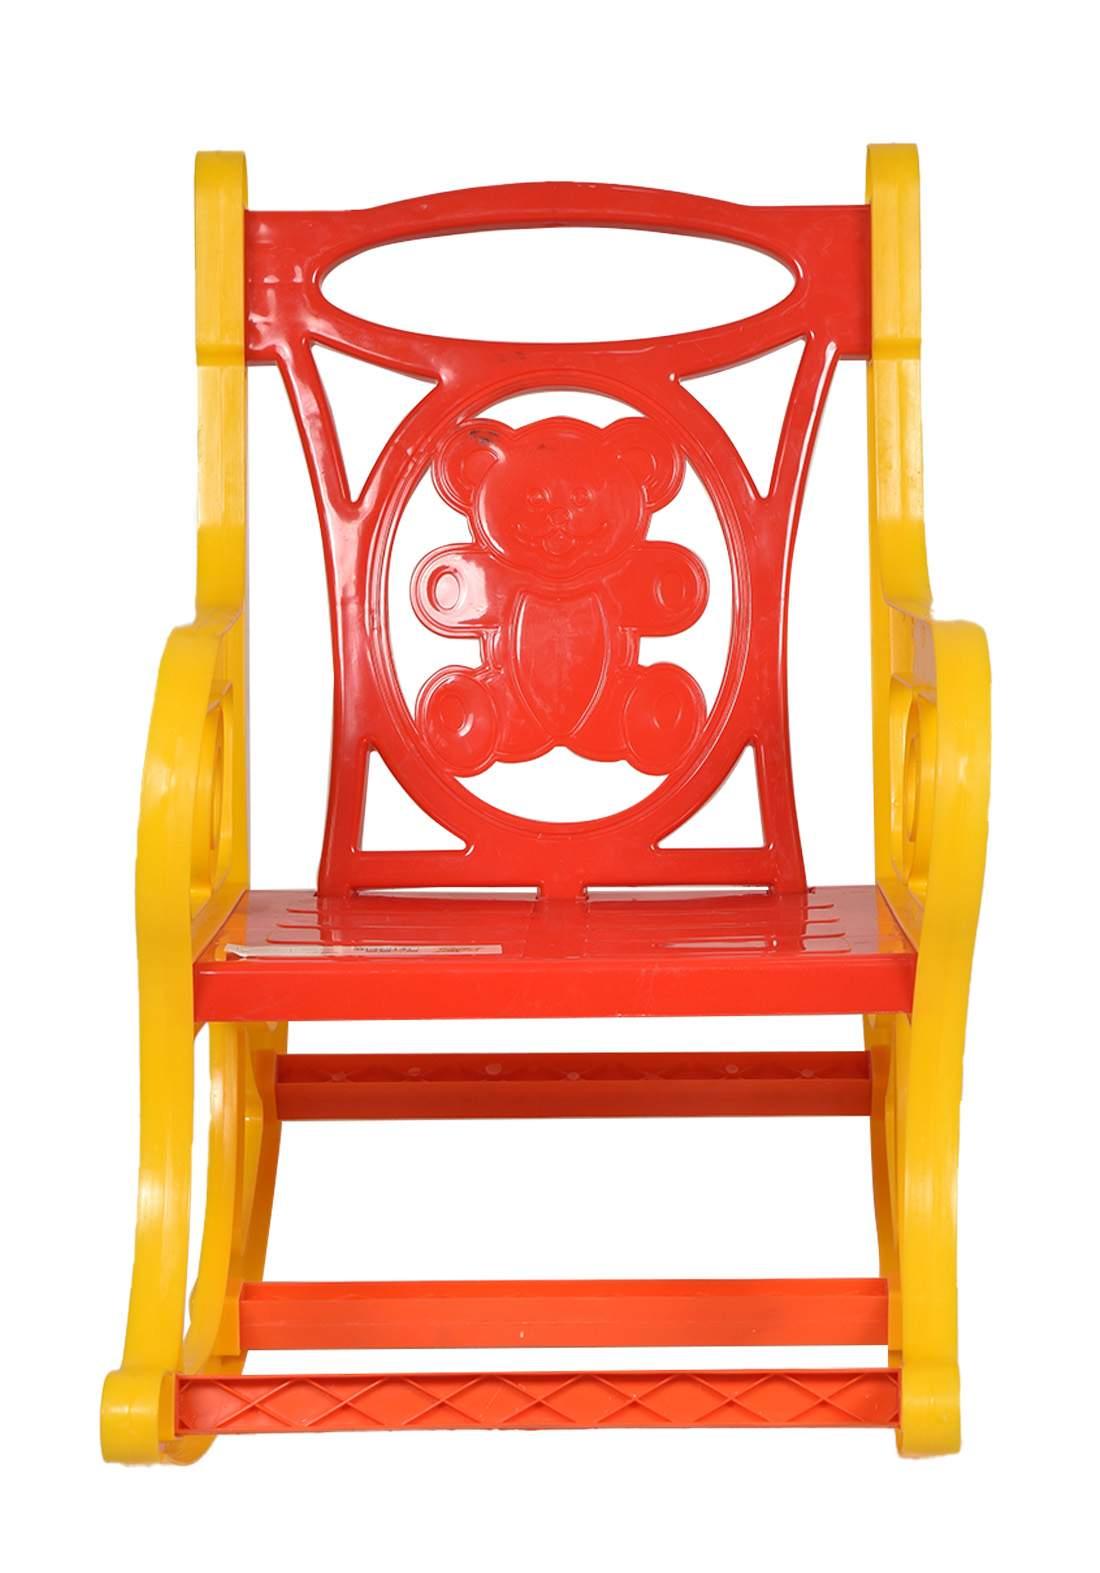 Baby Rocking  Chair كرسي هزاز للأطفال